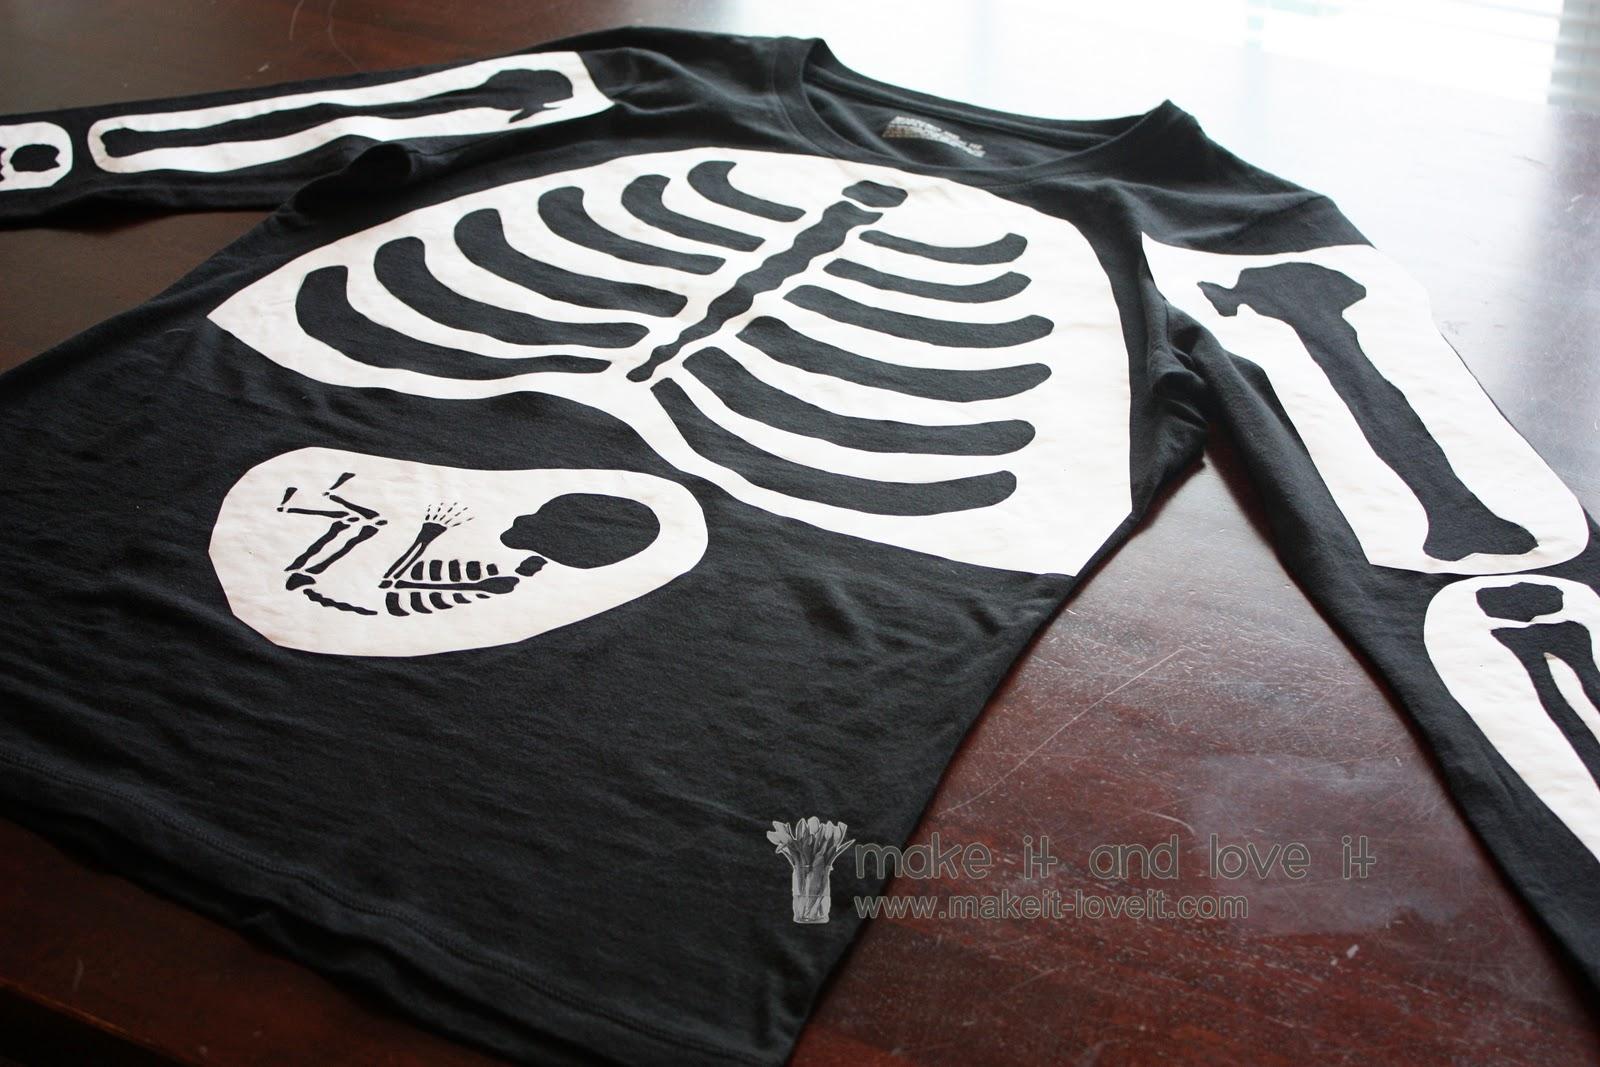 Diy maternity skeleton shirt find it, make it, love it.